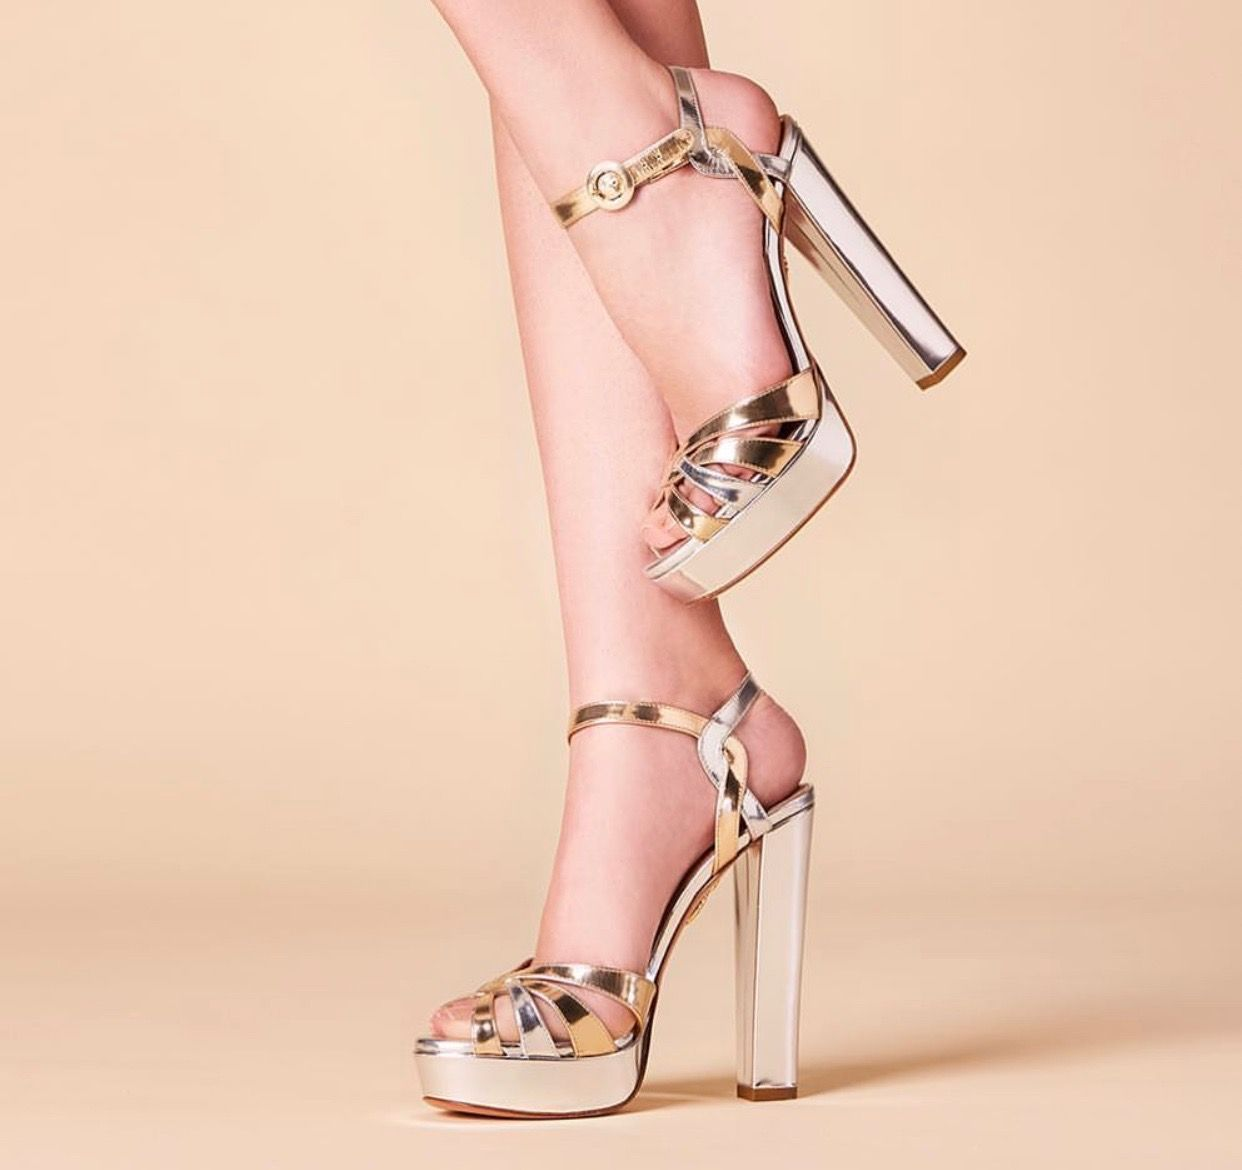 Aquazzura Stiletto 2019  shoes  shoesaddict  sandals  zapatos  estilo   fashion  style  vanessacrestto  stiletto 66273b595db0